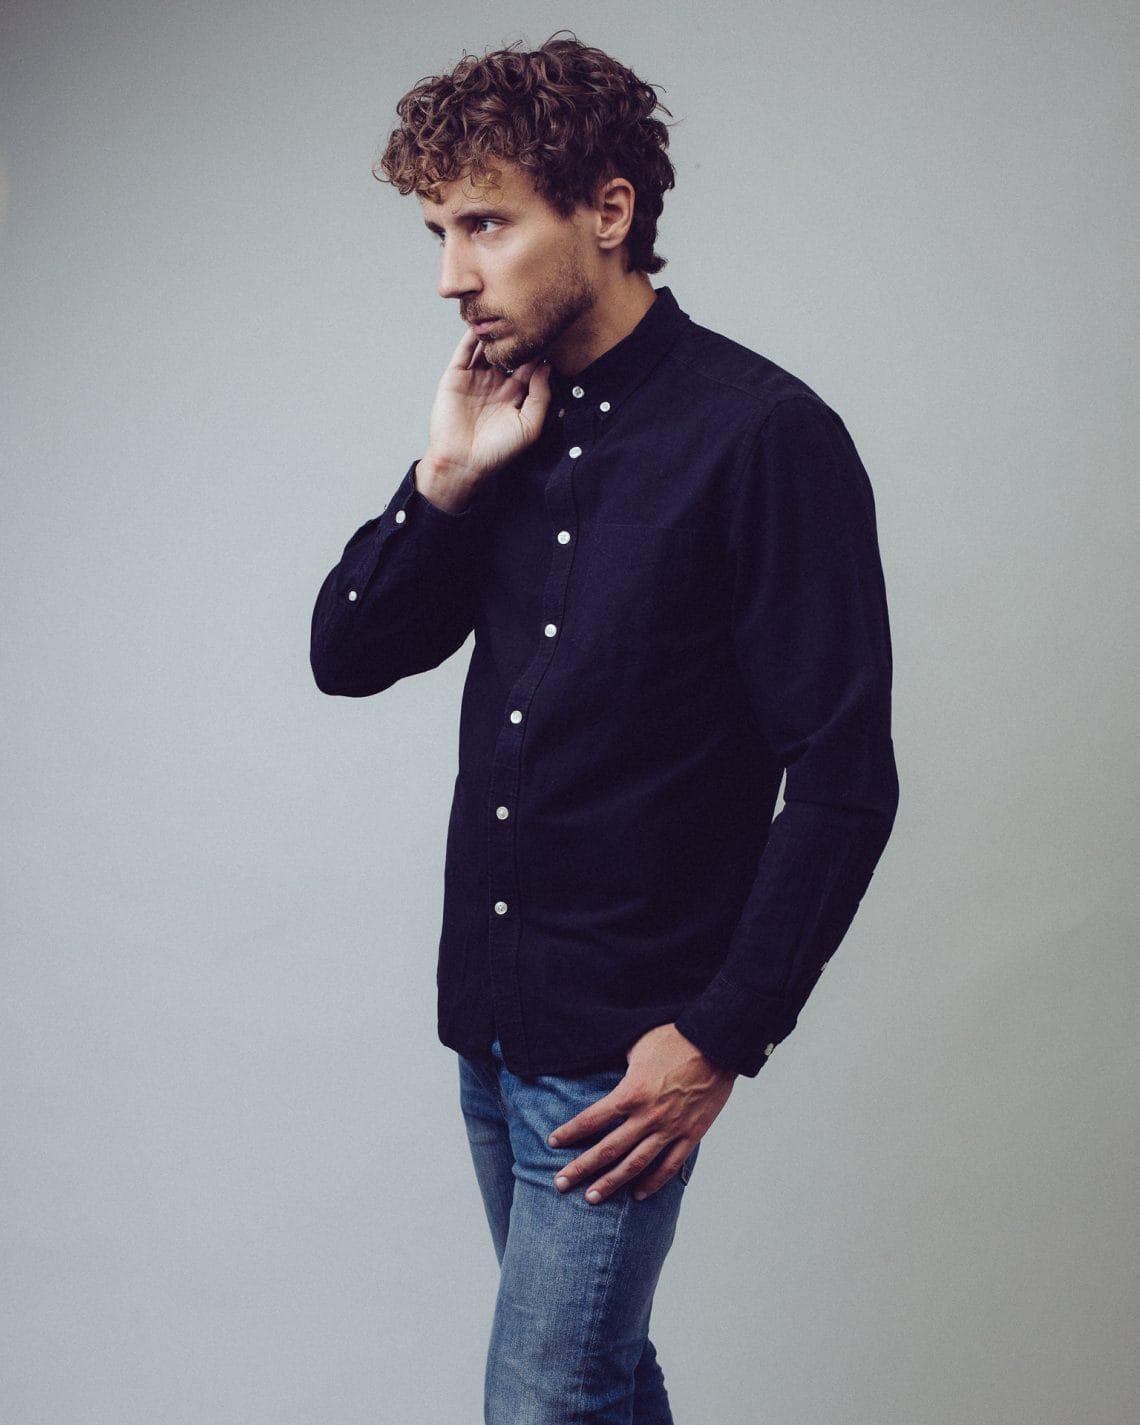 Jonas Nordqvist